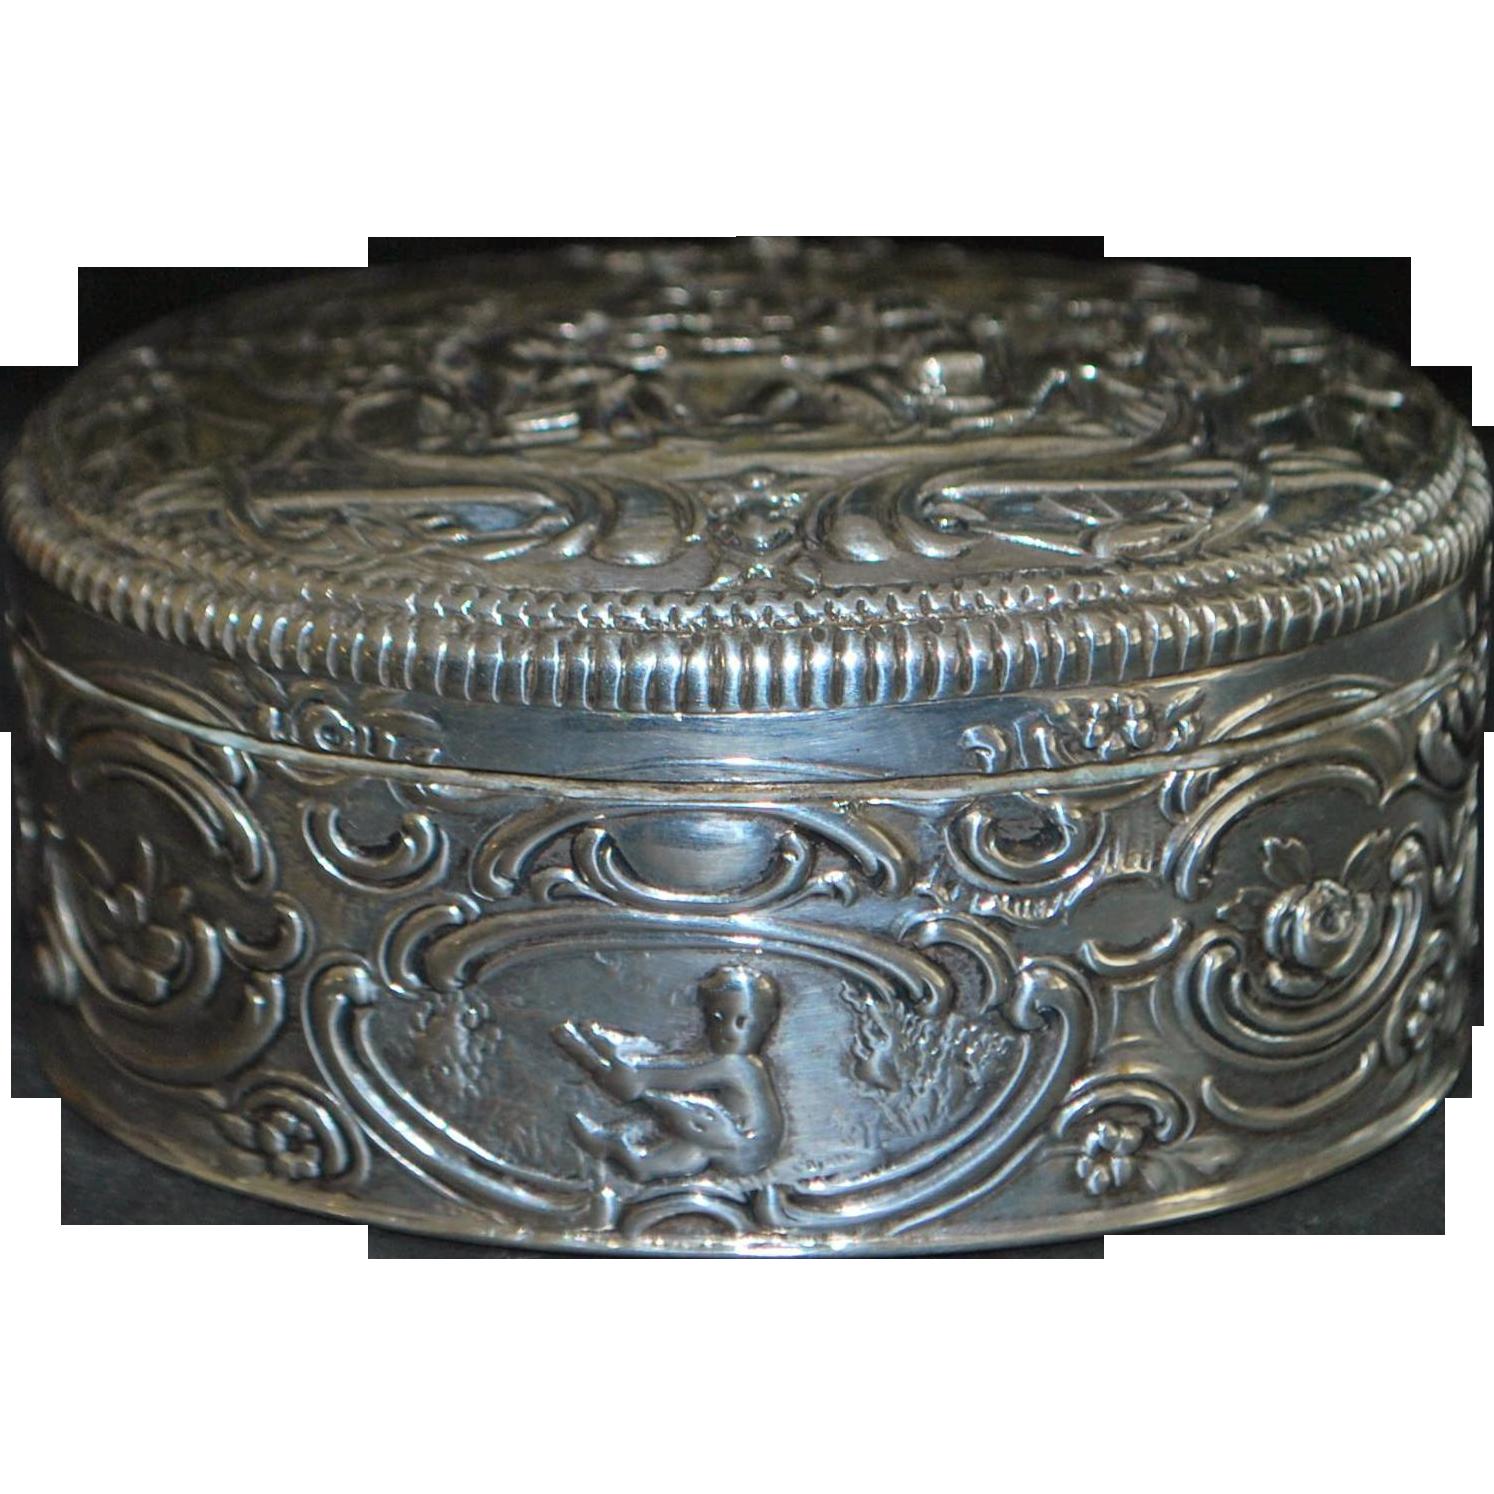 German Loth 13 Silver Repousse Snuff Box - 1880